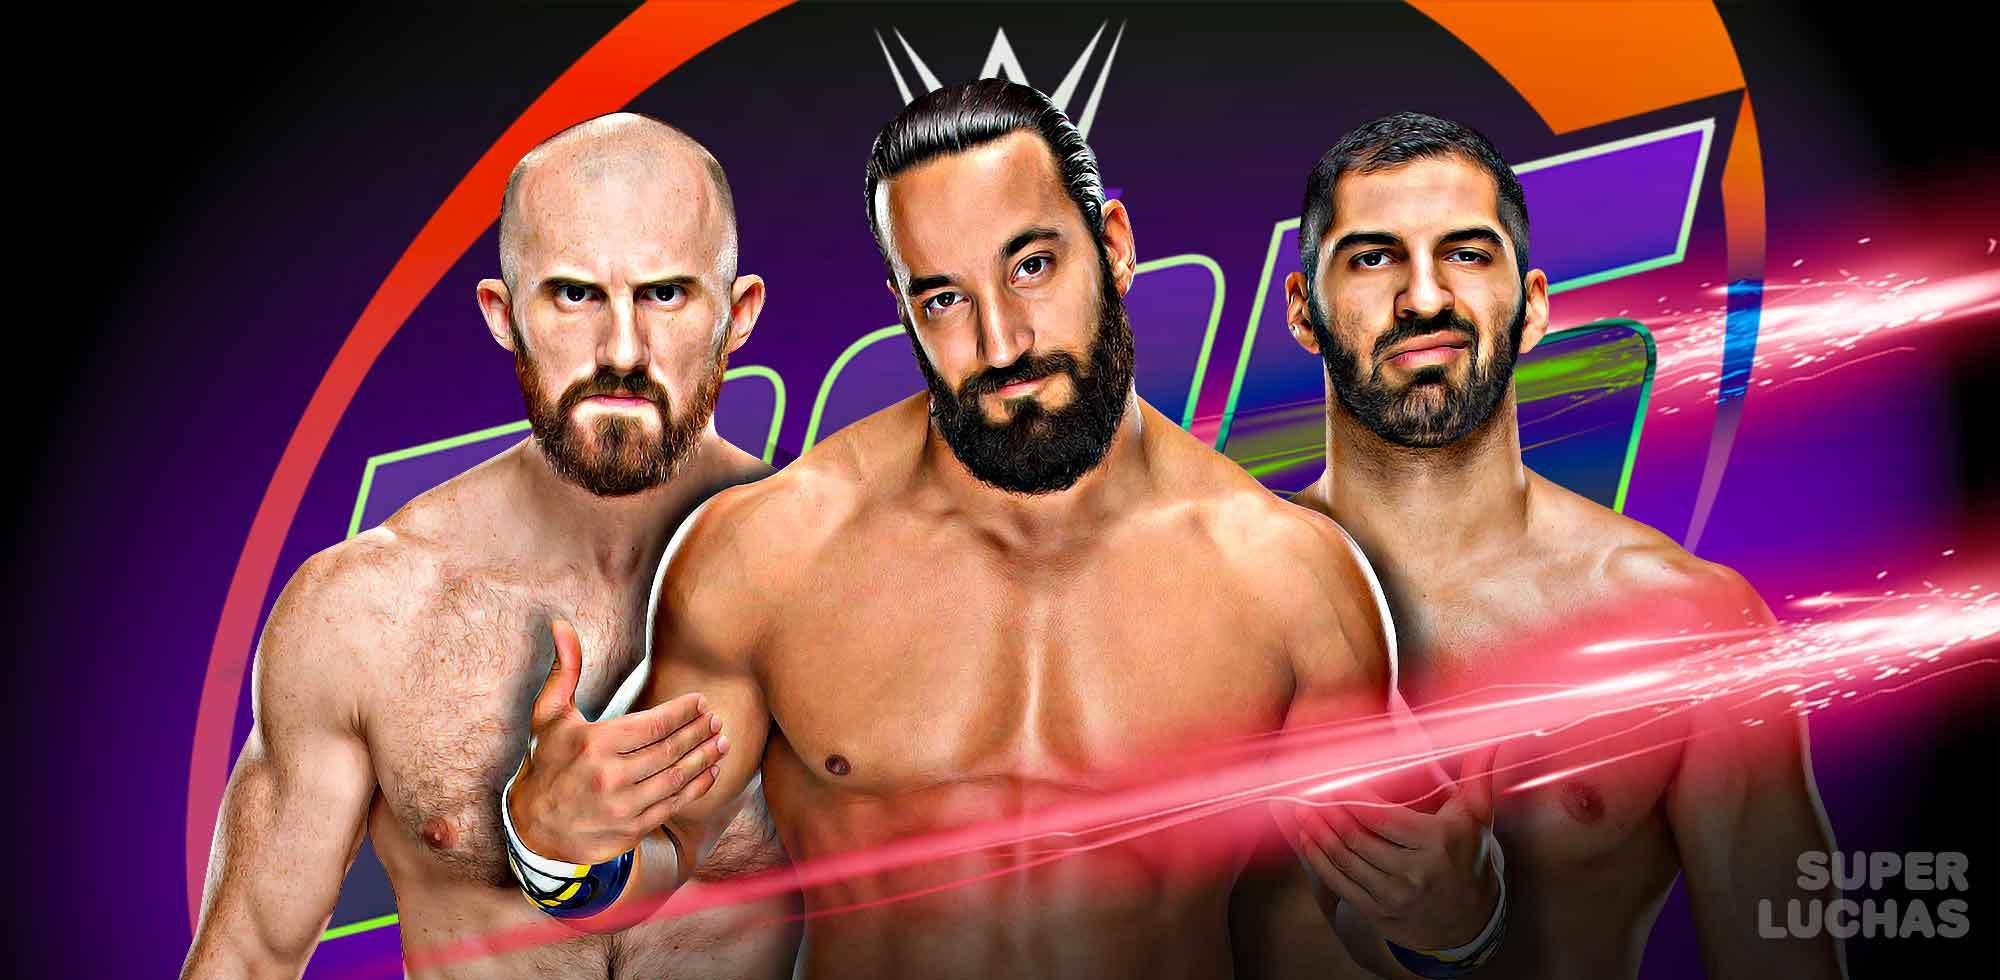 Resultados WWE 205 Live 18 de octubre 2019